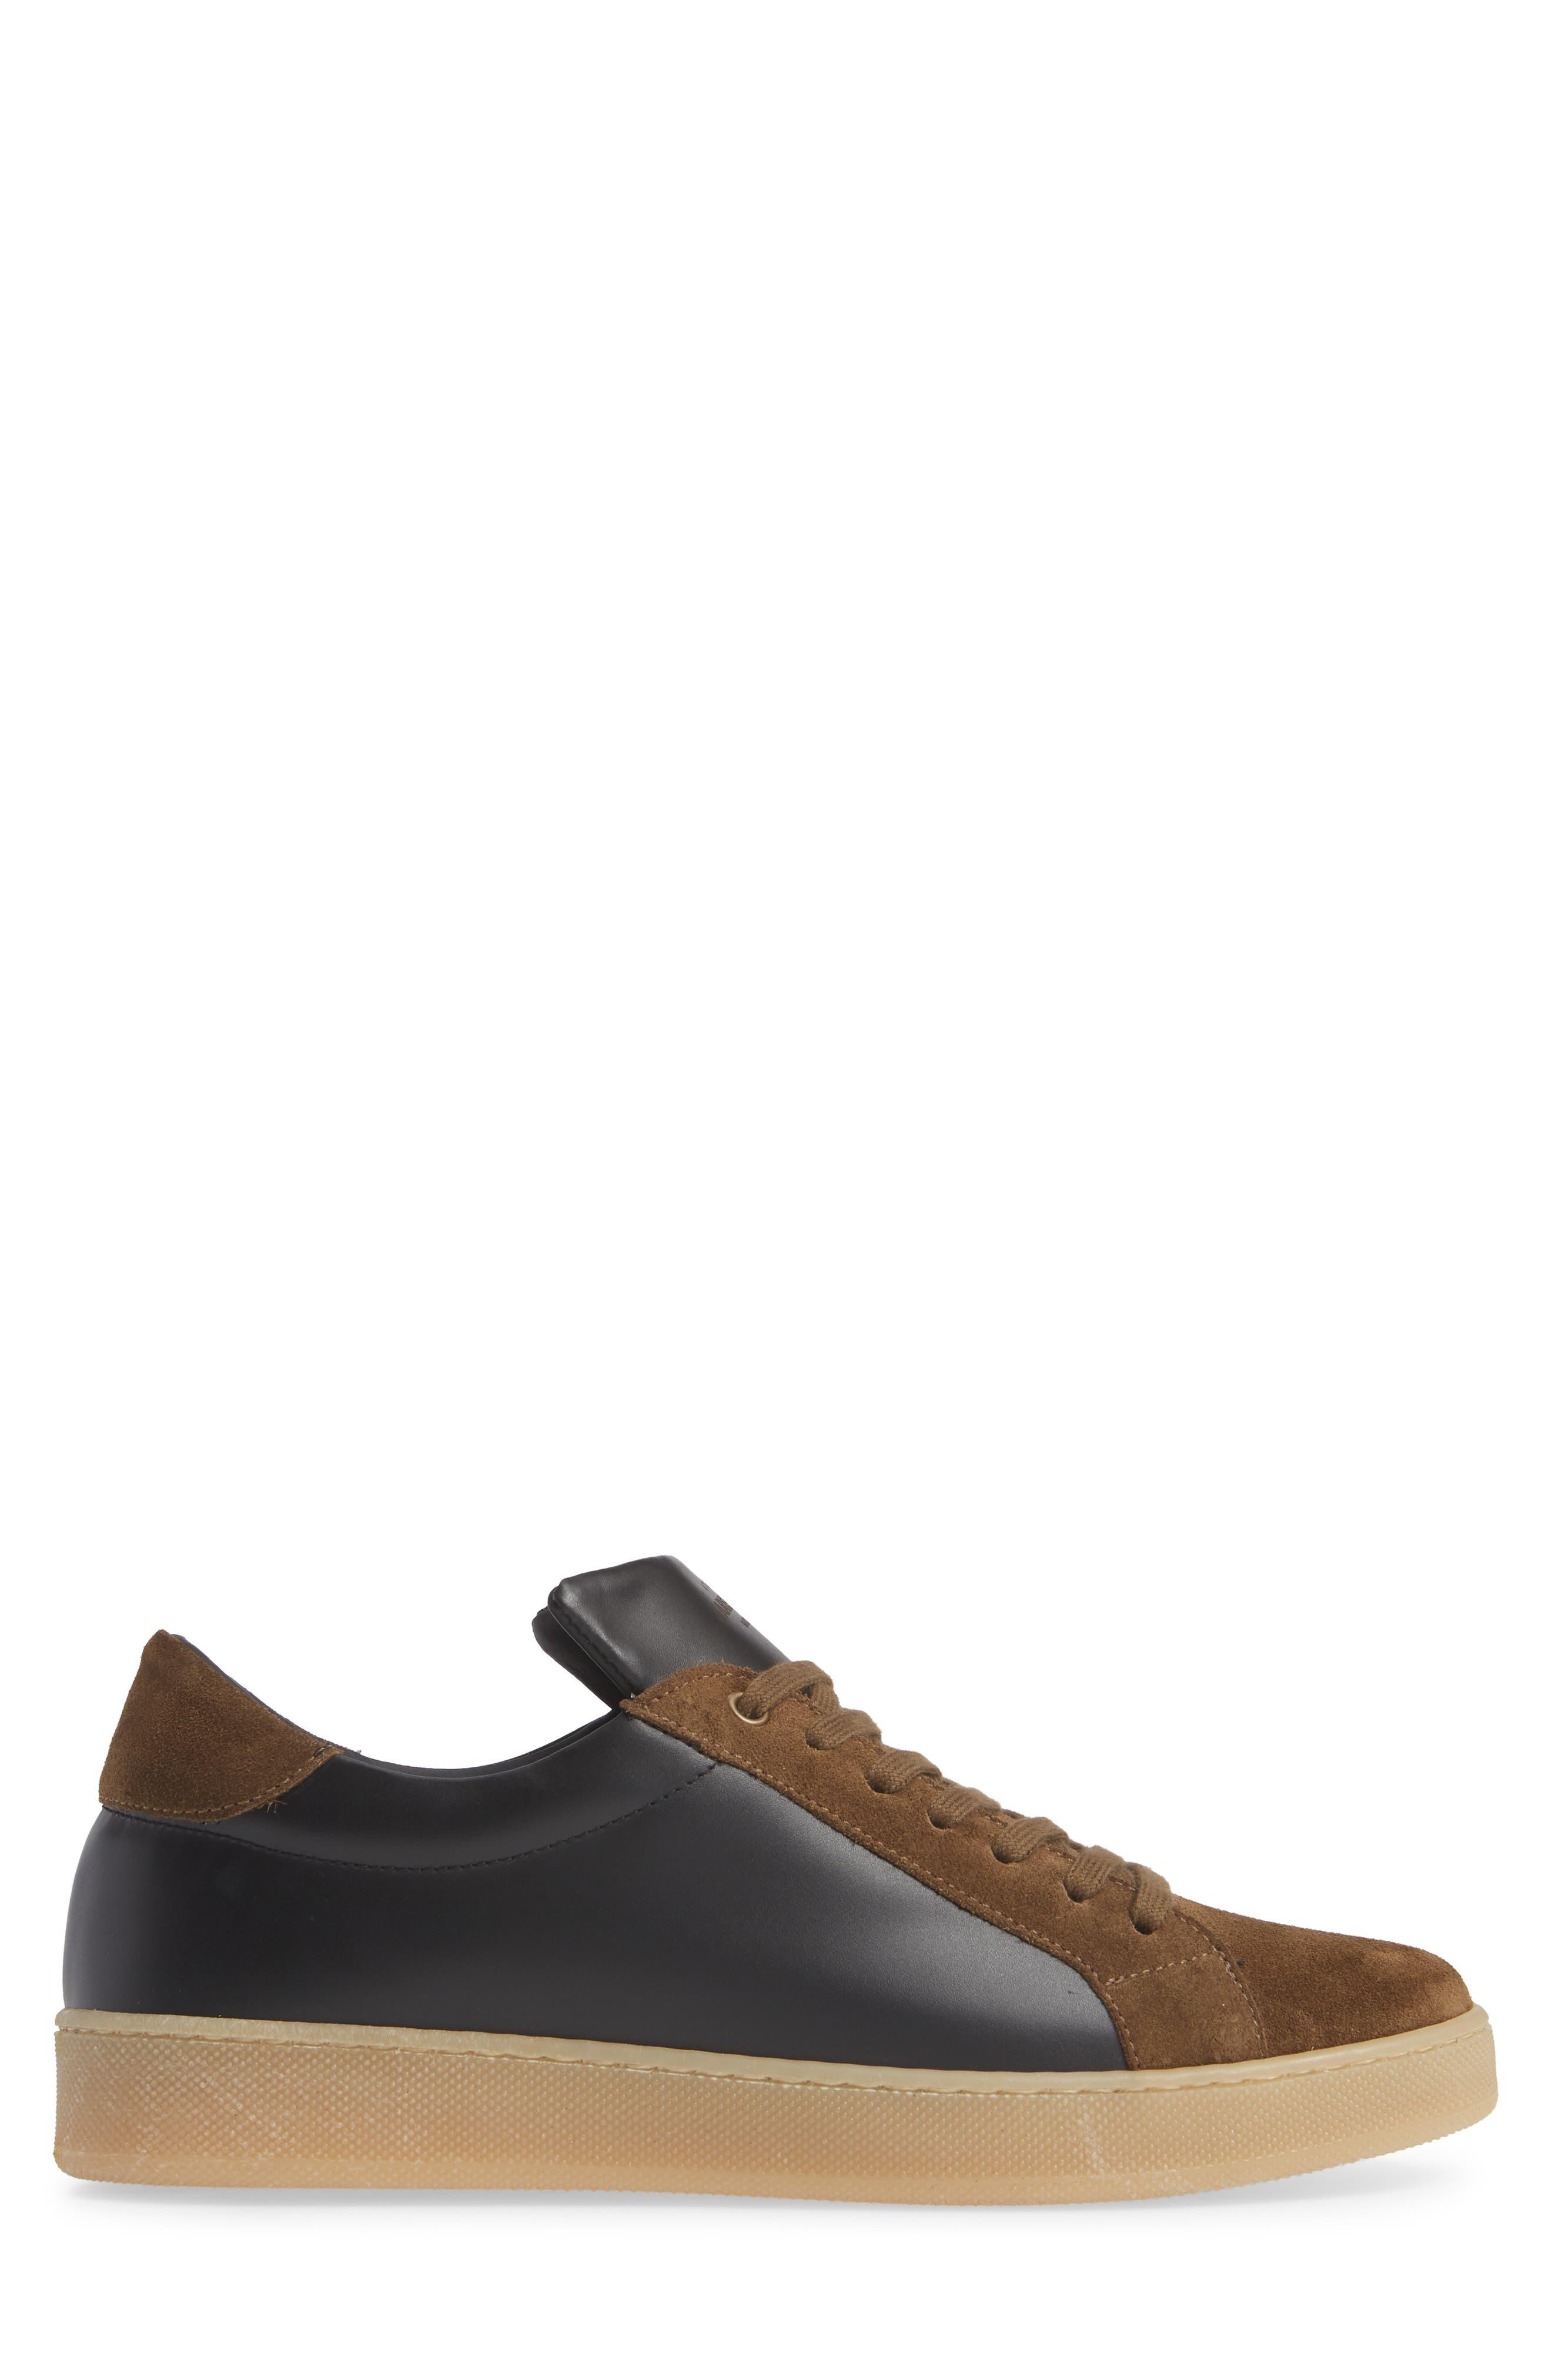 Rome Sneaker,                             Alternate thumbnail 3, color,                             BLACK/ GEIGE